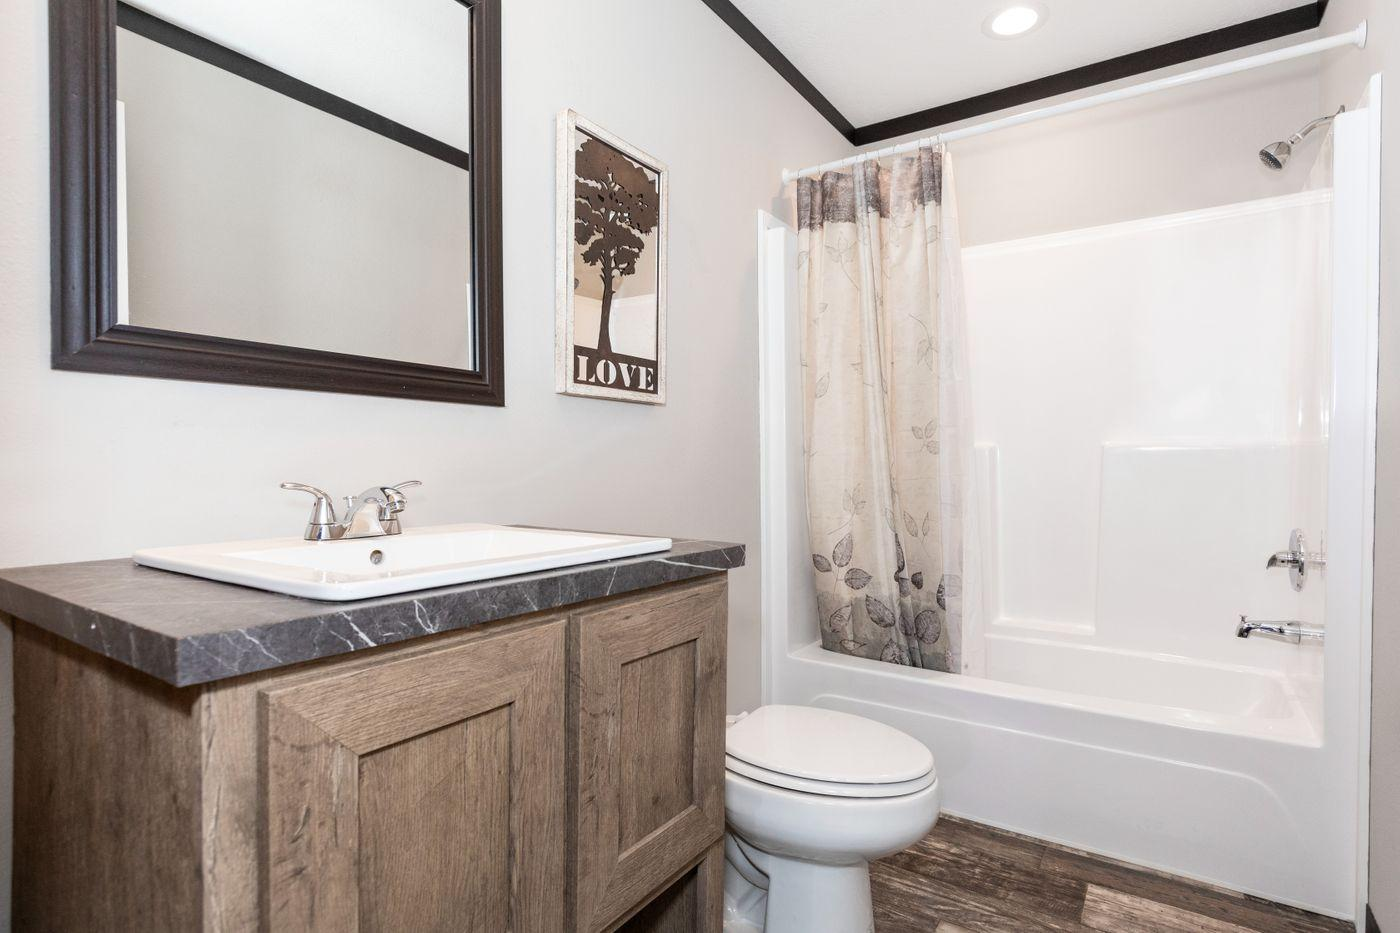 Boujee Bathroom